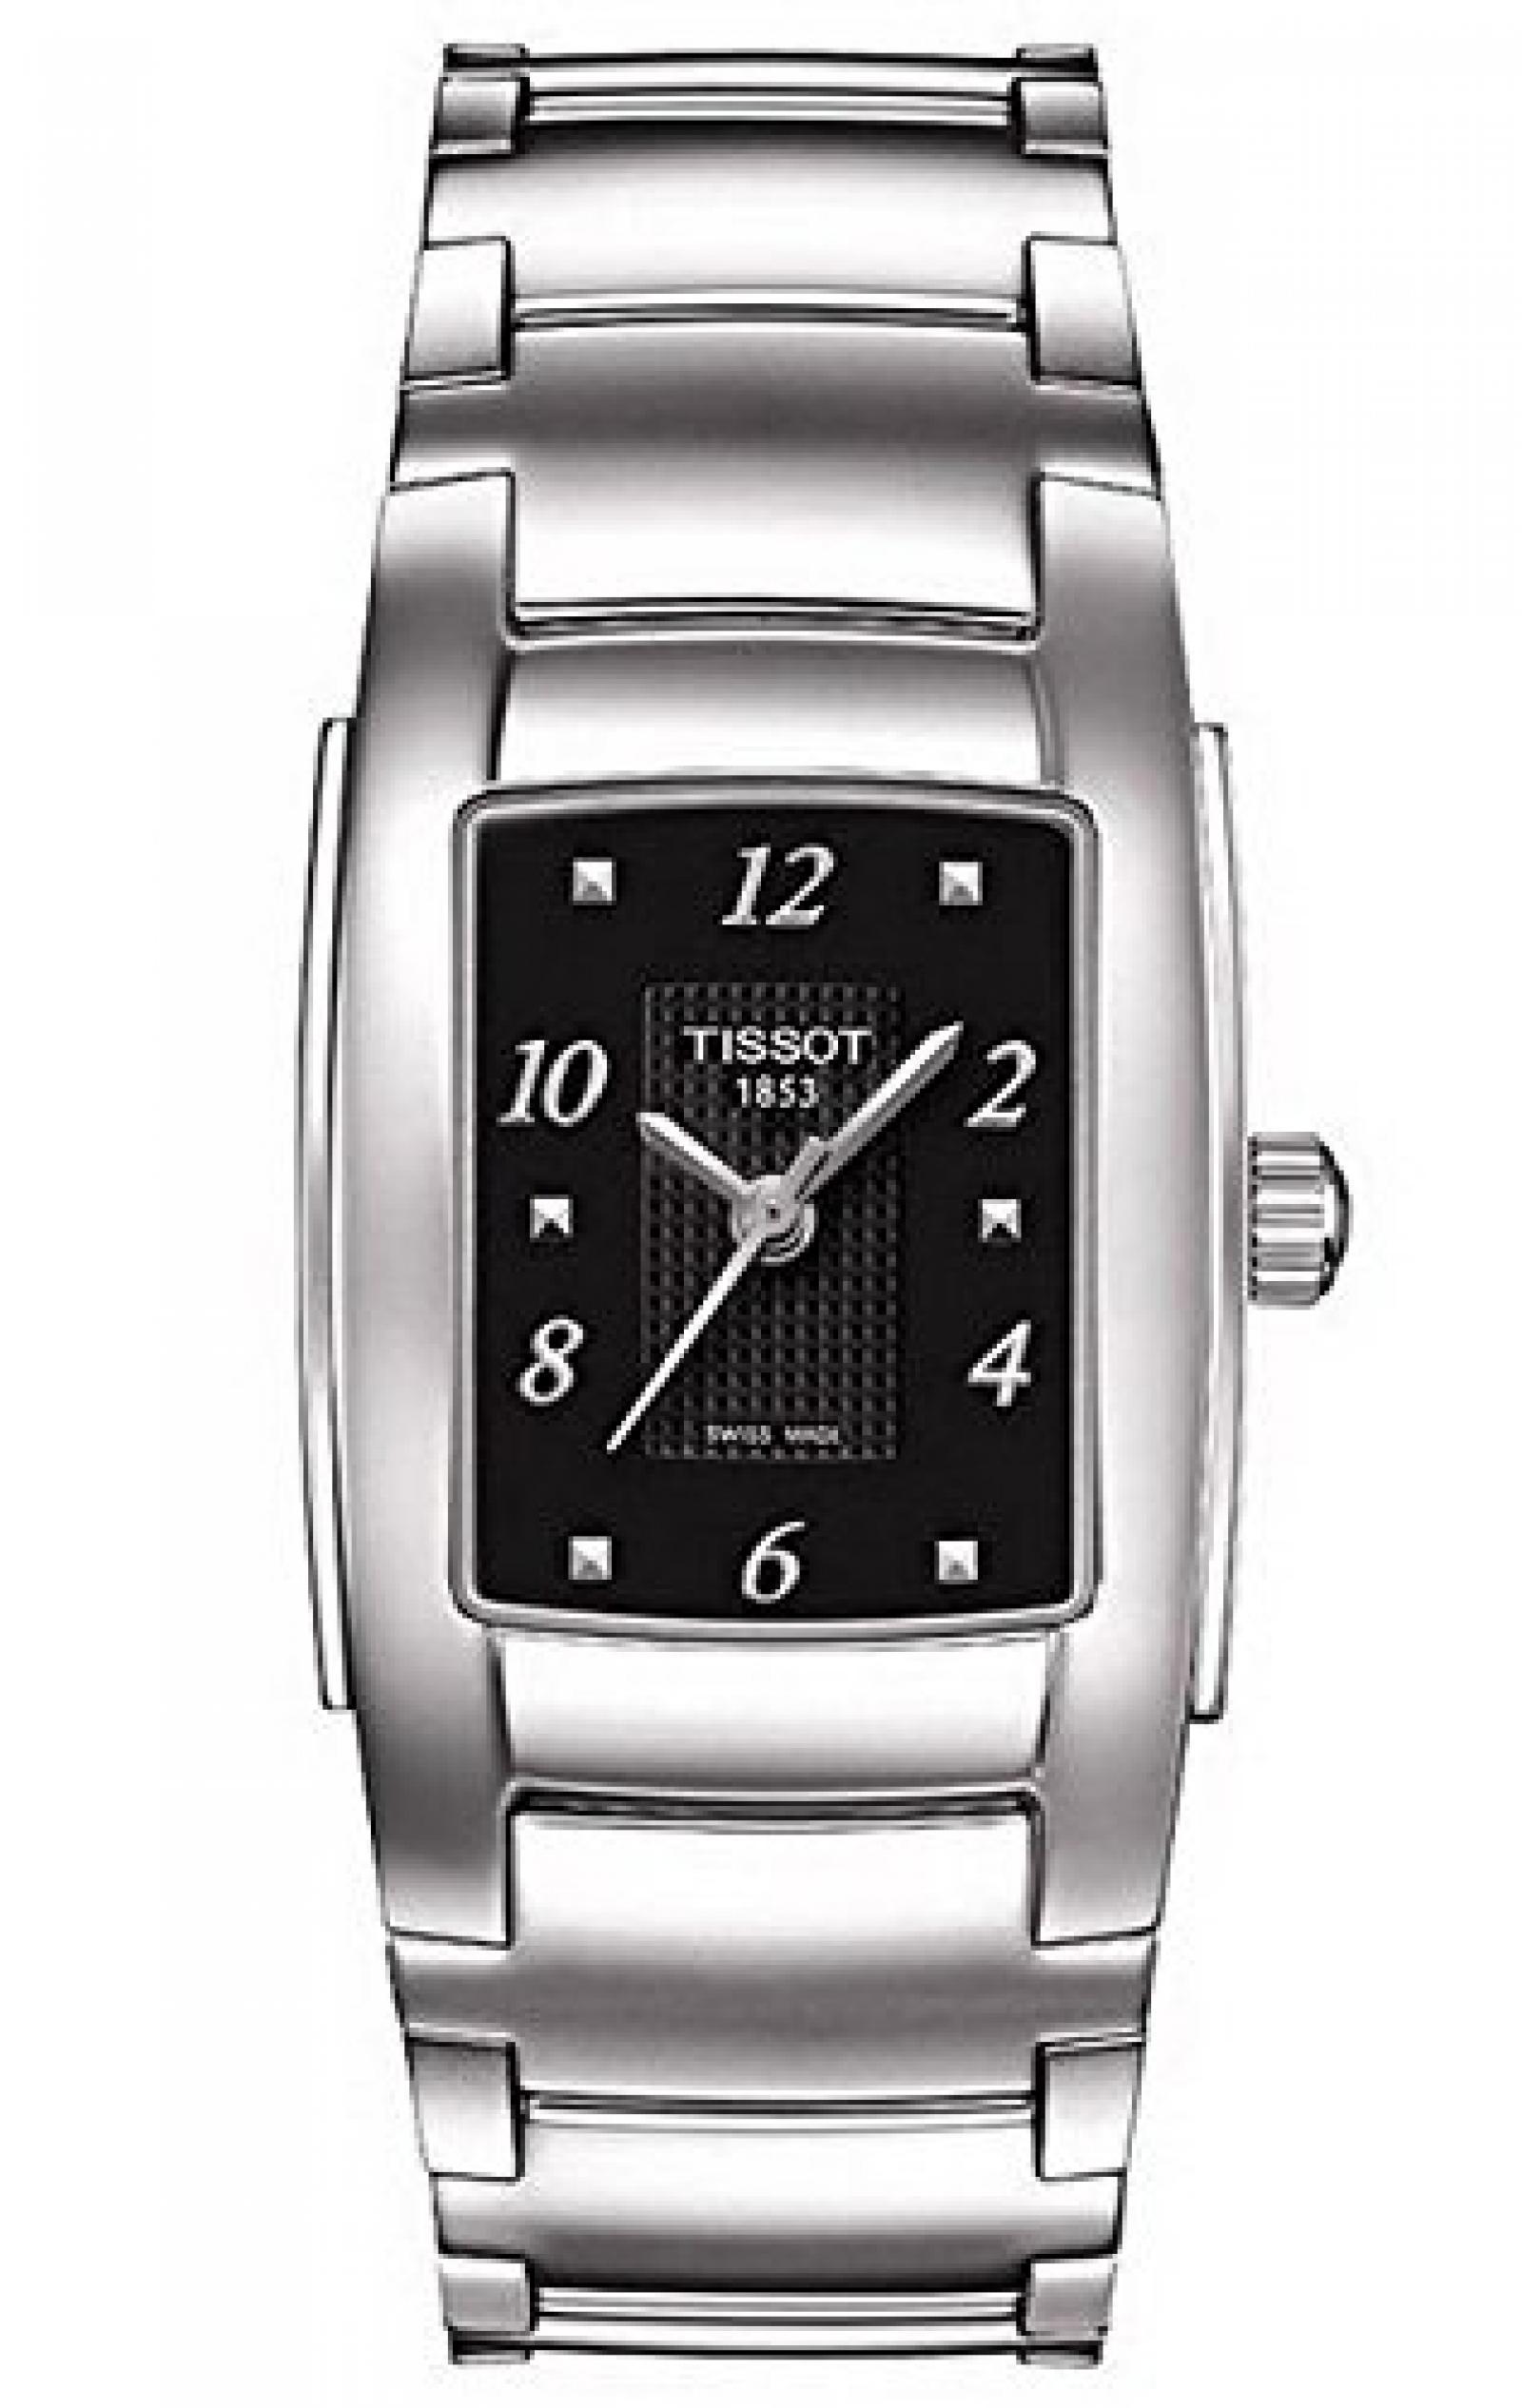 Tissot Damen-Armbanduhr T10 Lady Analog Quarz Edelstahl T073.310.11.057.00